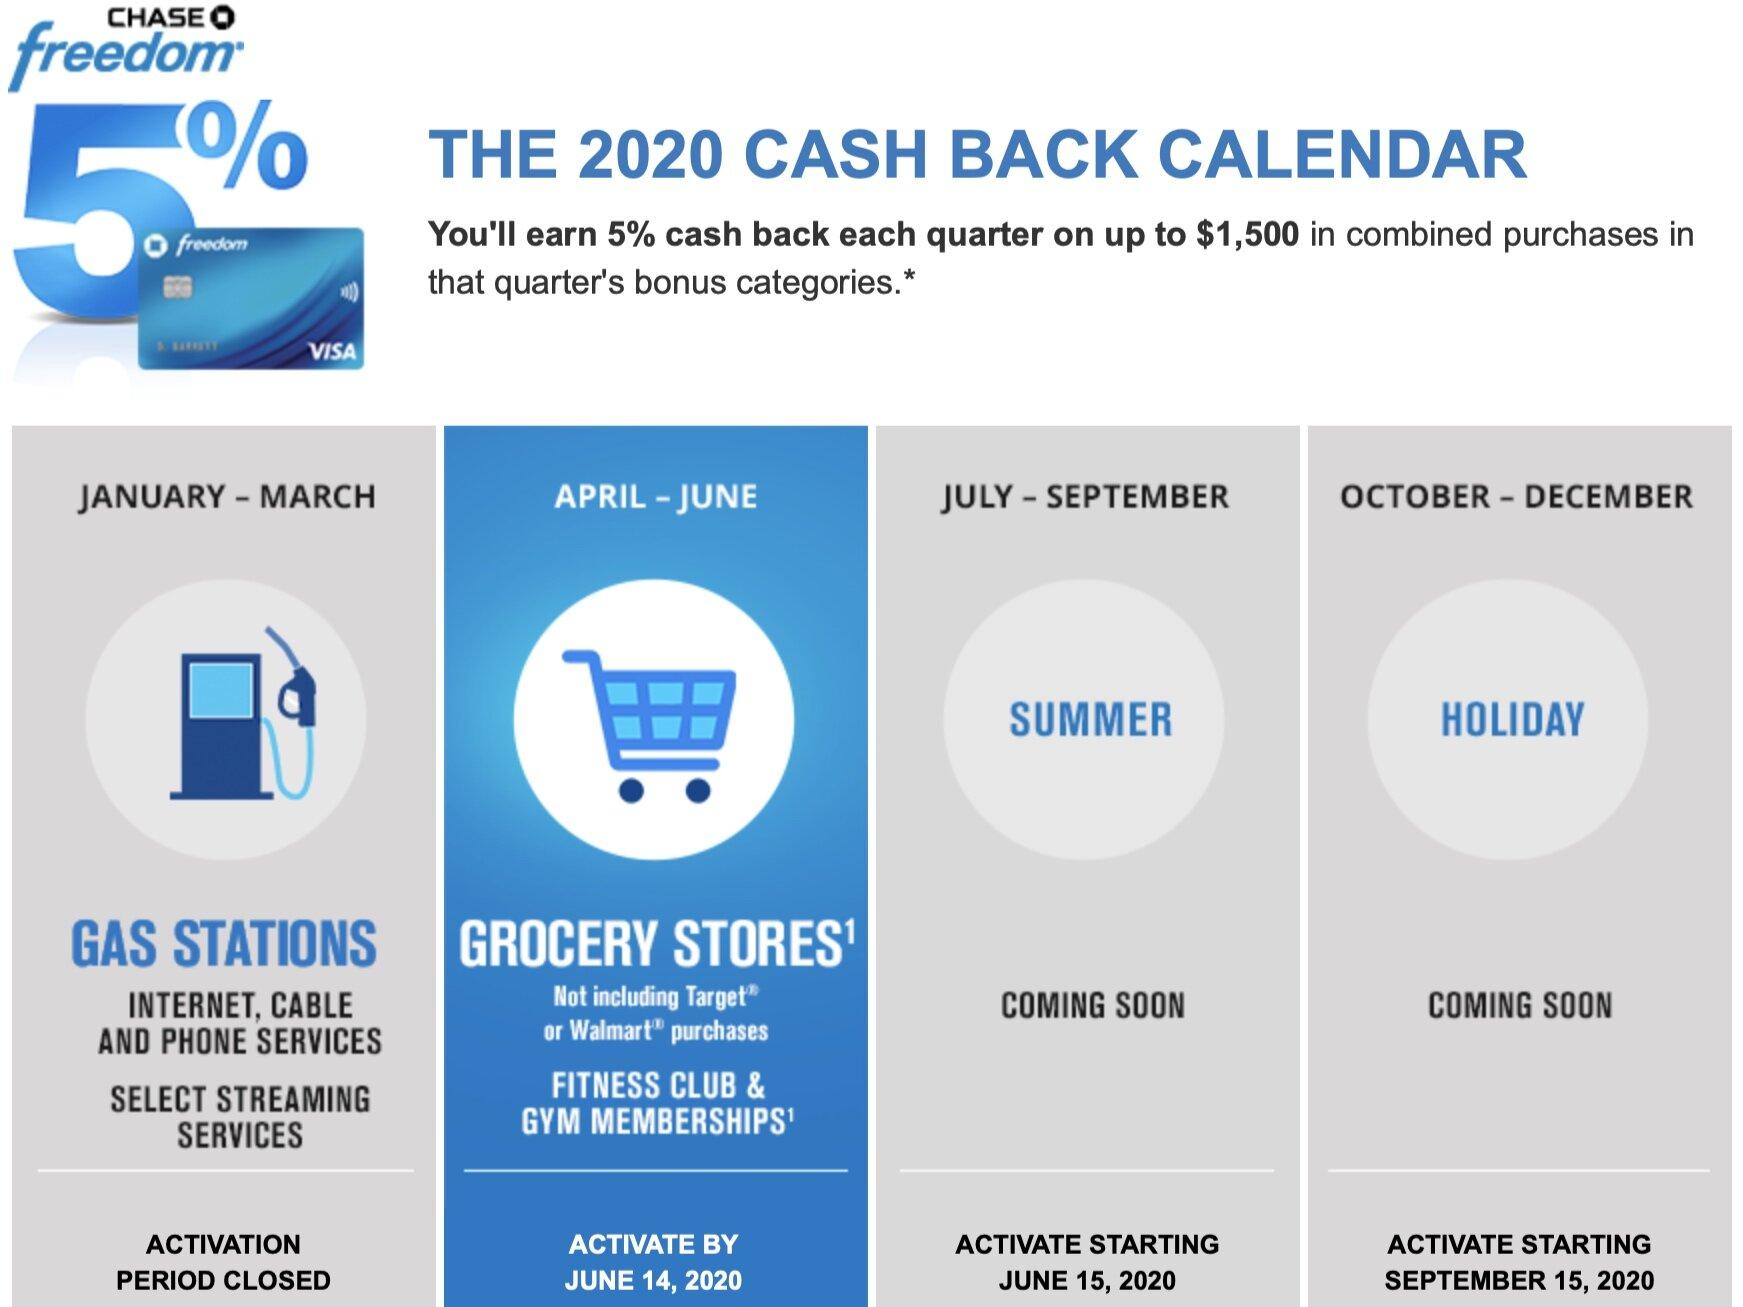 Chase Freedom Cash Back Calendar 2022.Chase Freedom Card 5 Cash Back Q2 2020 Stretching Each Dollar